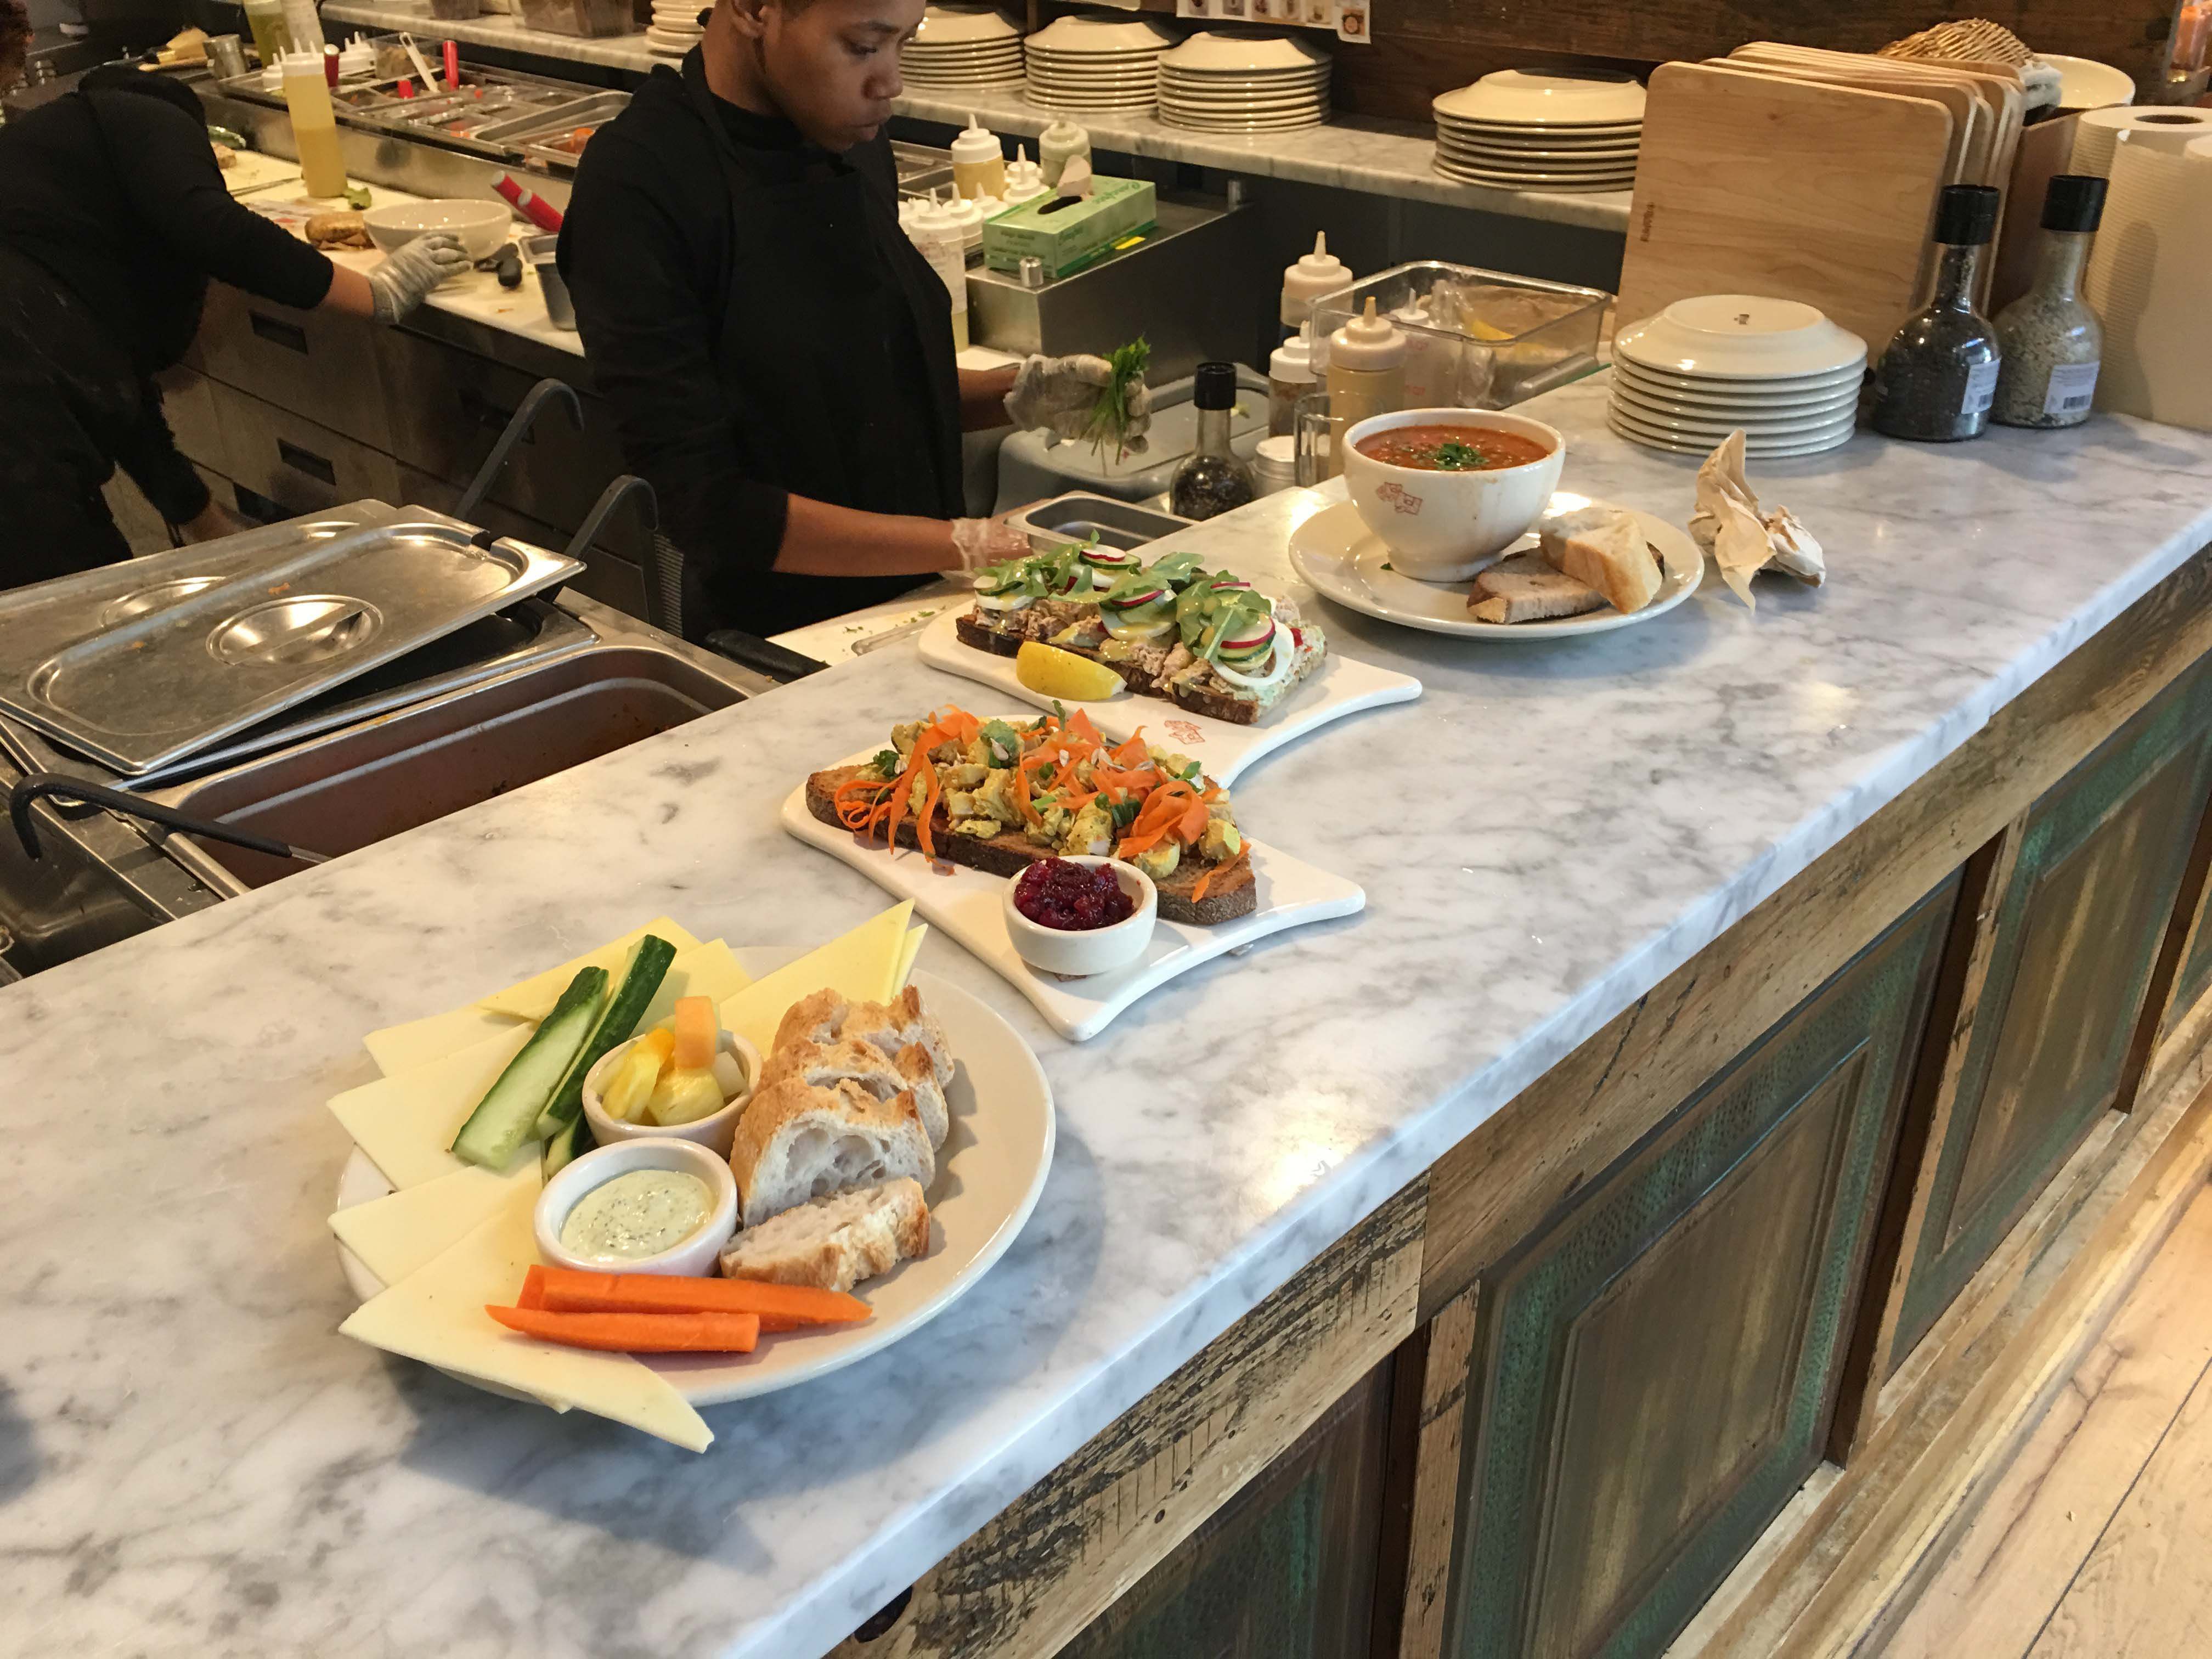 le-pain-quotidein-food-to-serve